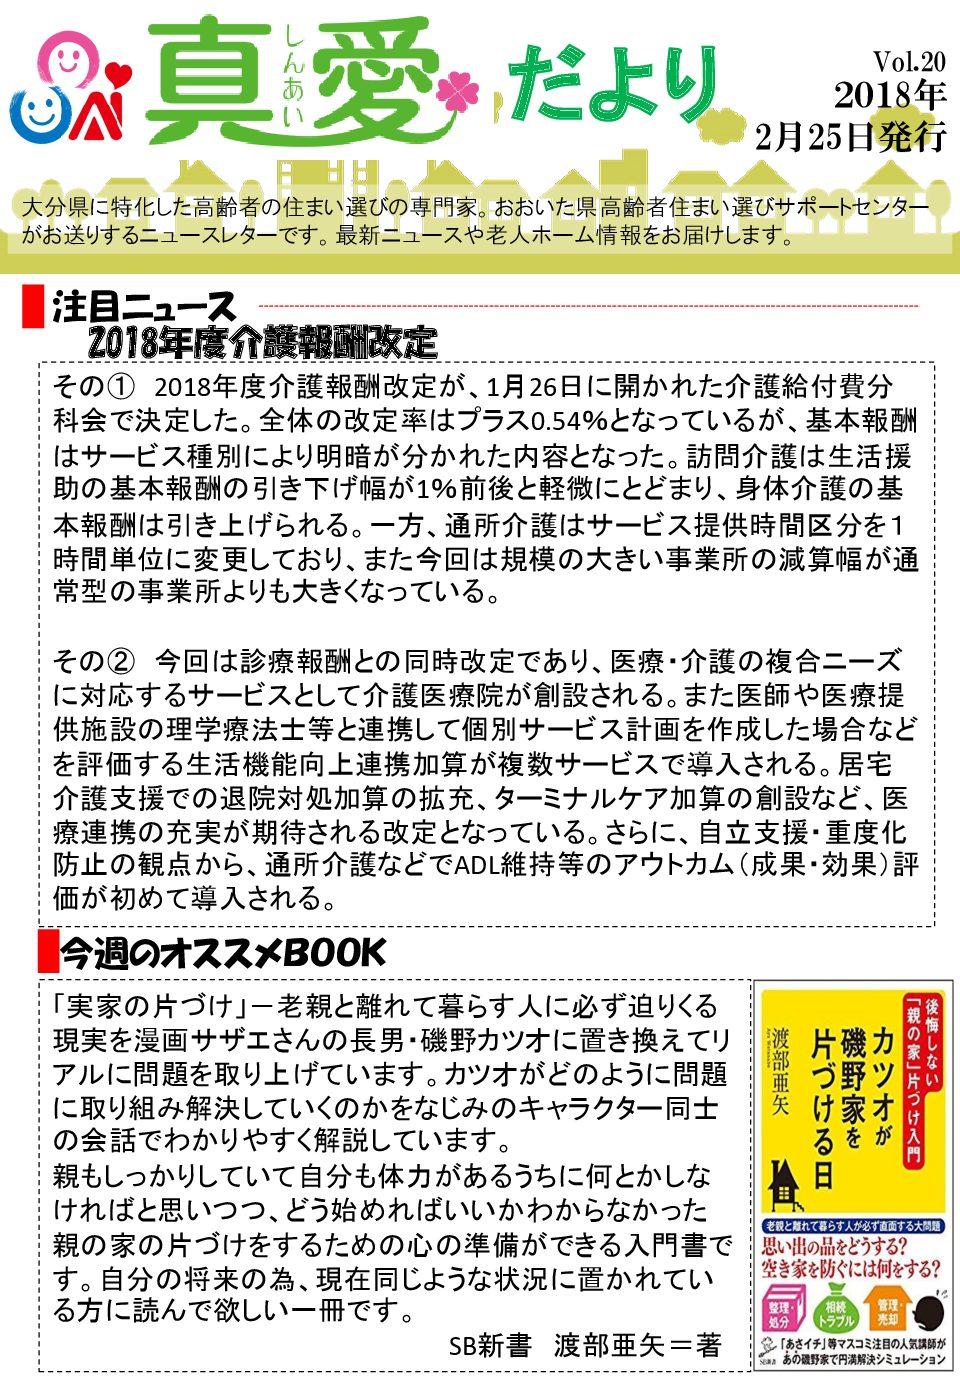 【Vol.20】 2018.02.25発行